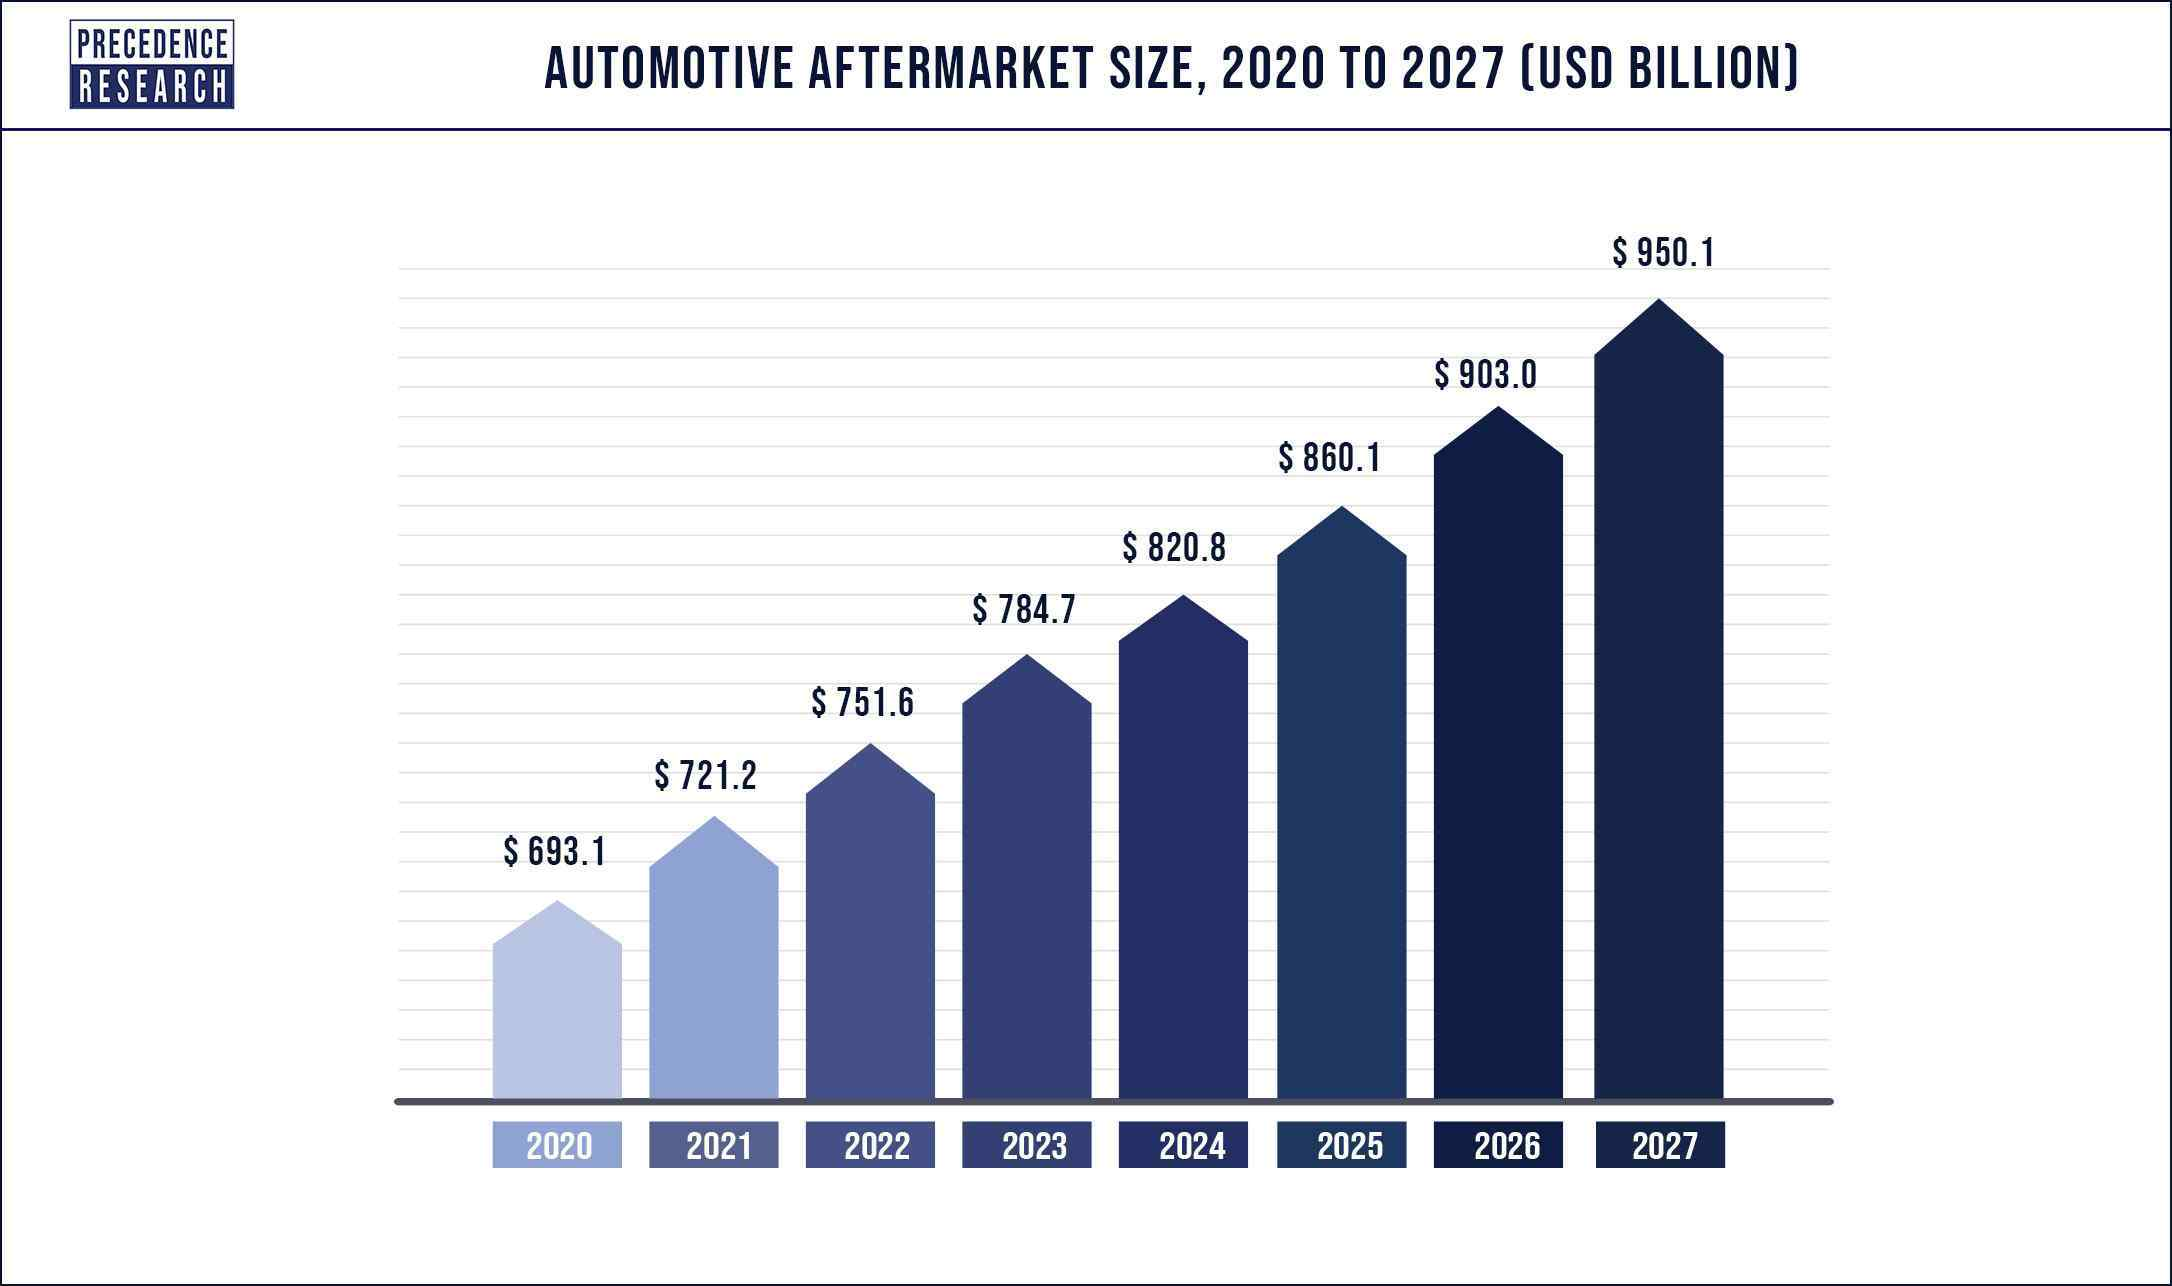 Automotive Aftermarket Size 2020 to 2027